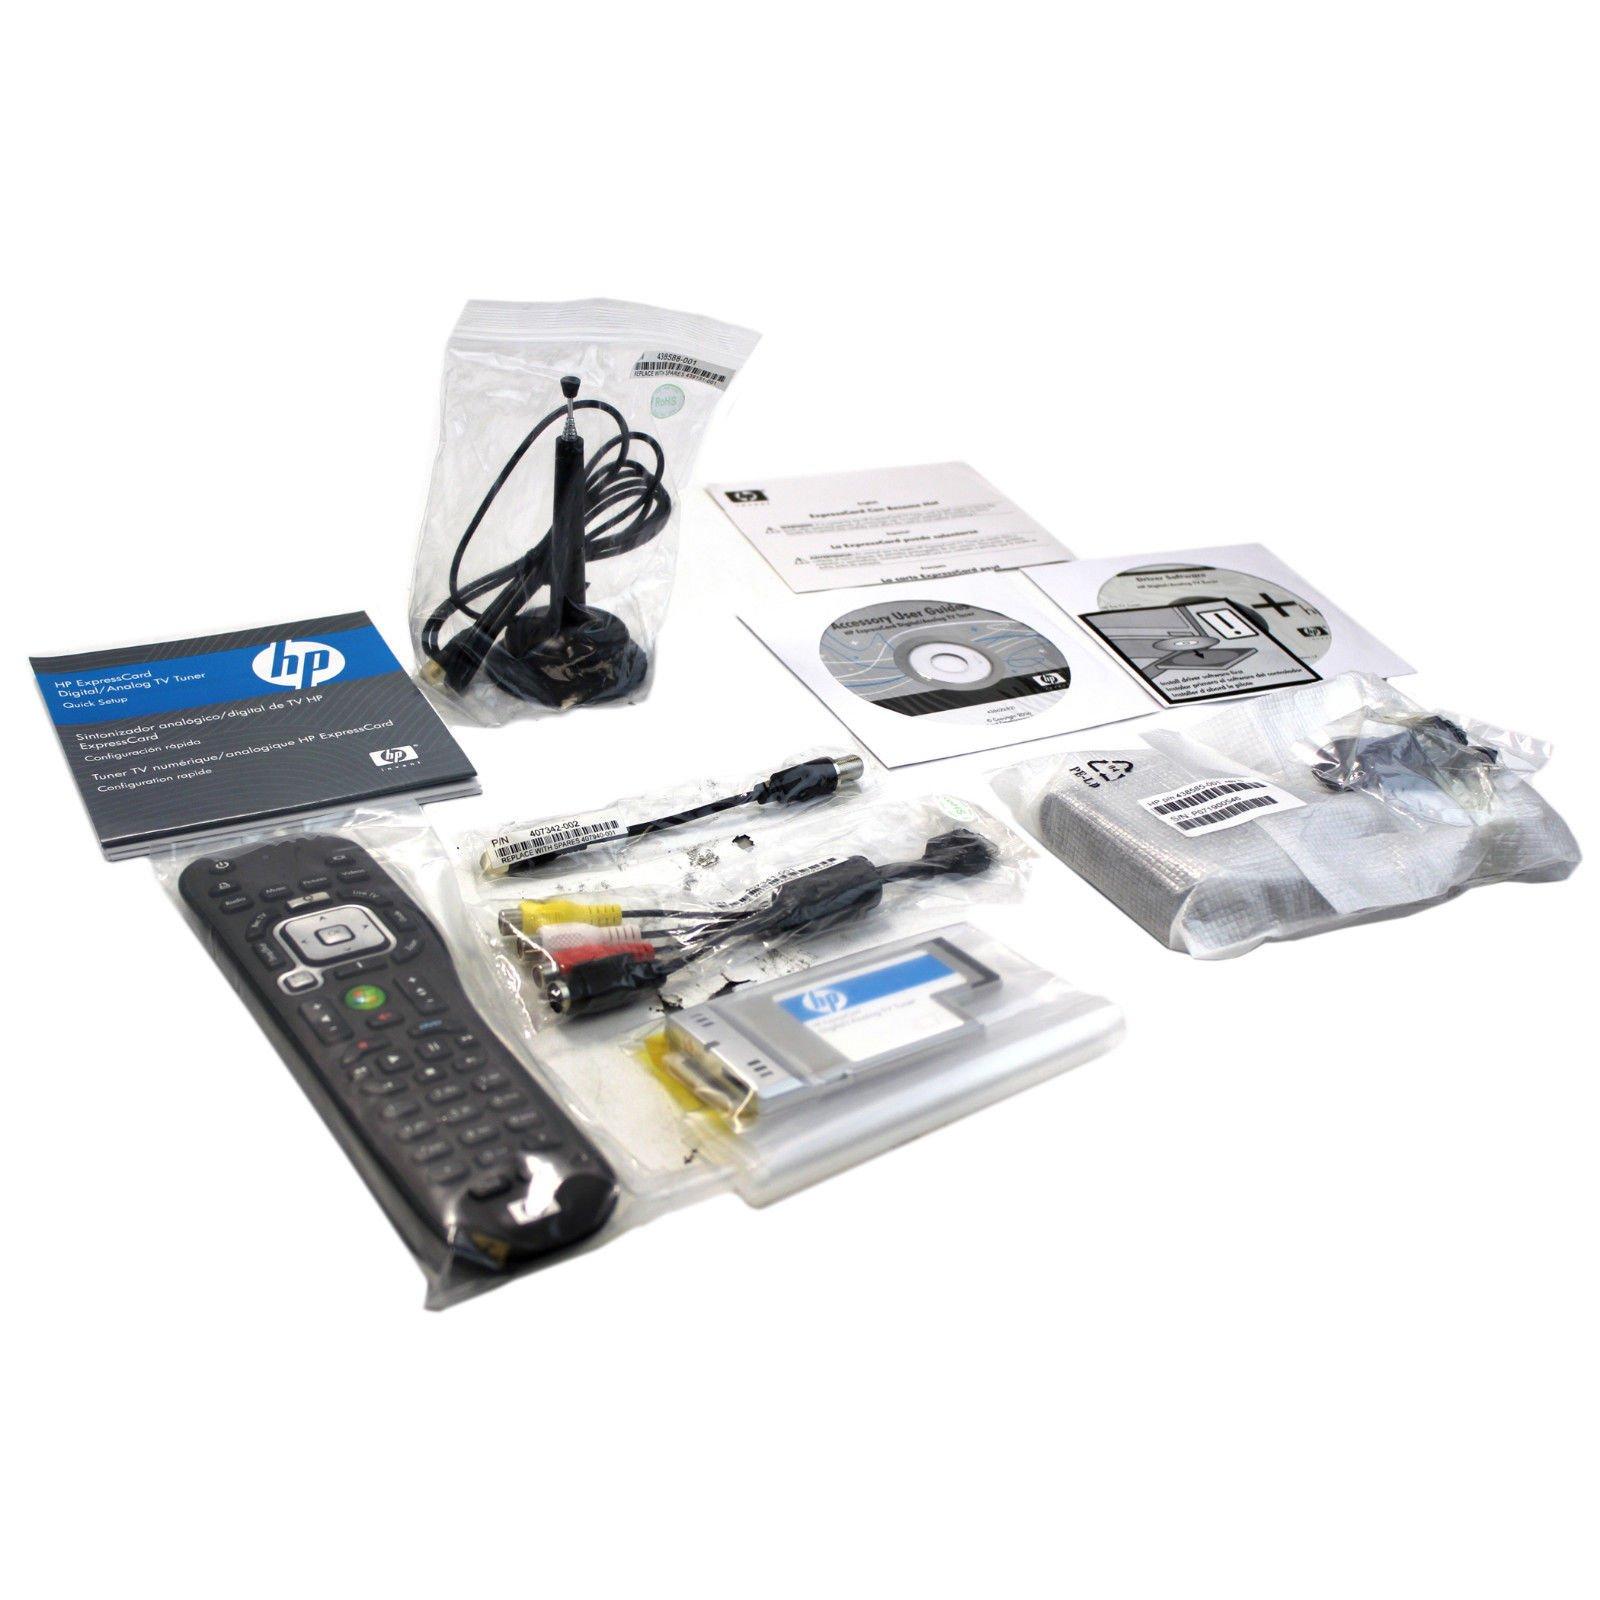 DRIVERS HP EXPRESSCARD TV TUNER